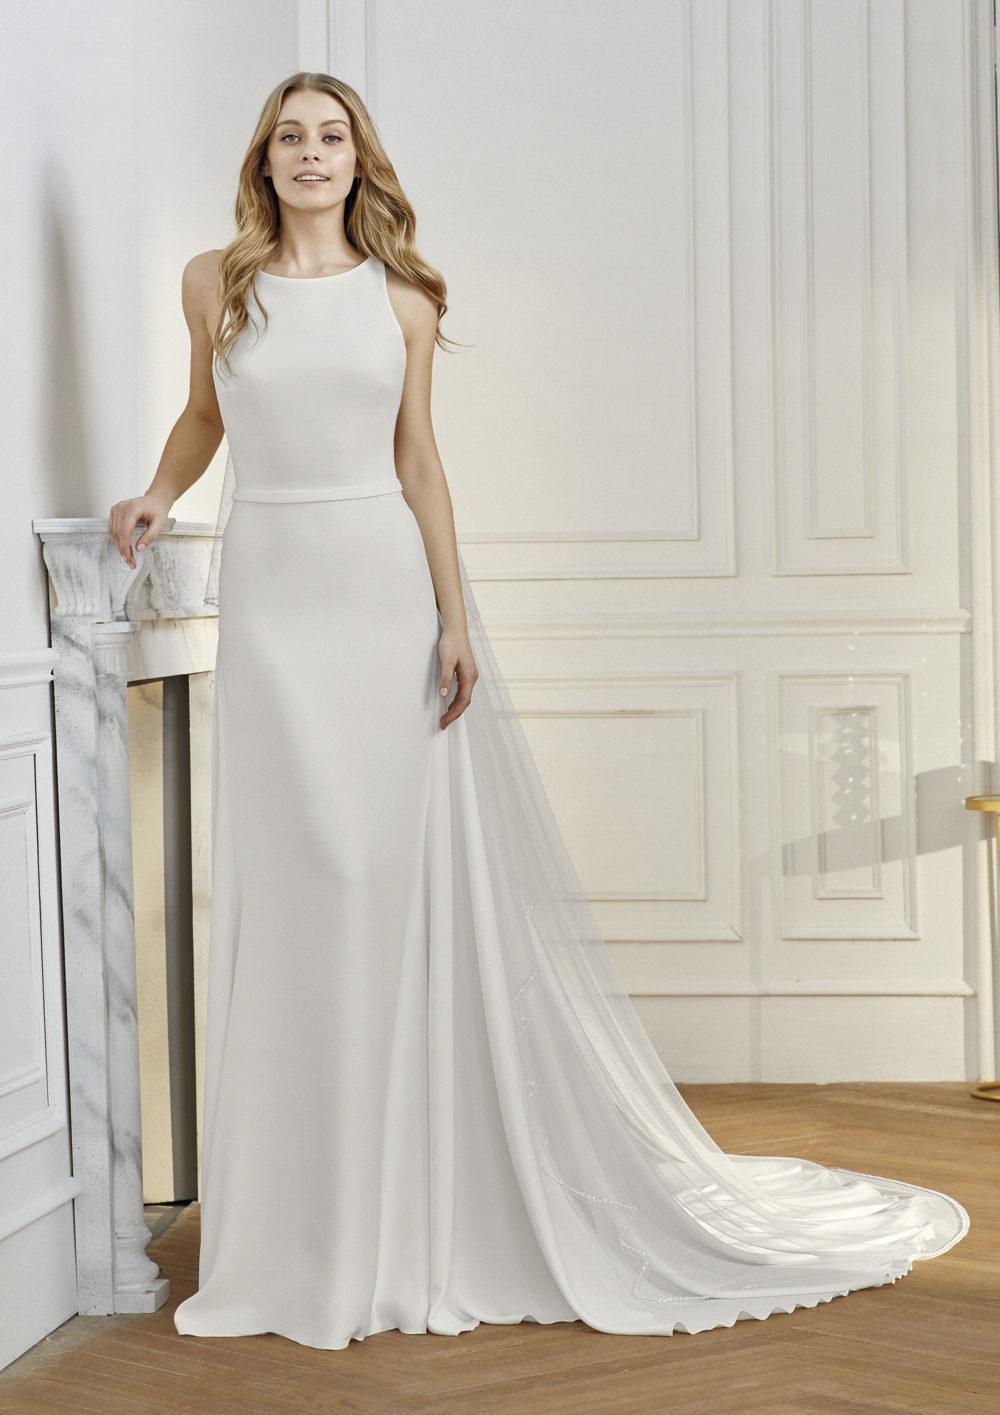 Mariages: abito da sposa San Patrick 2020 a Vicenza, Verona, Padova, Veneto LACAILLE